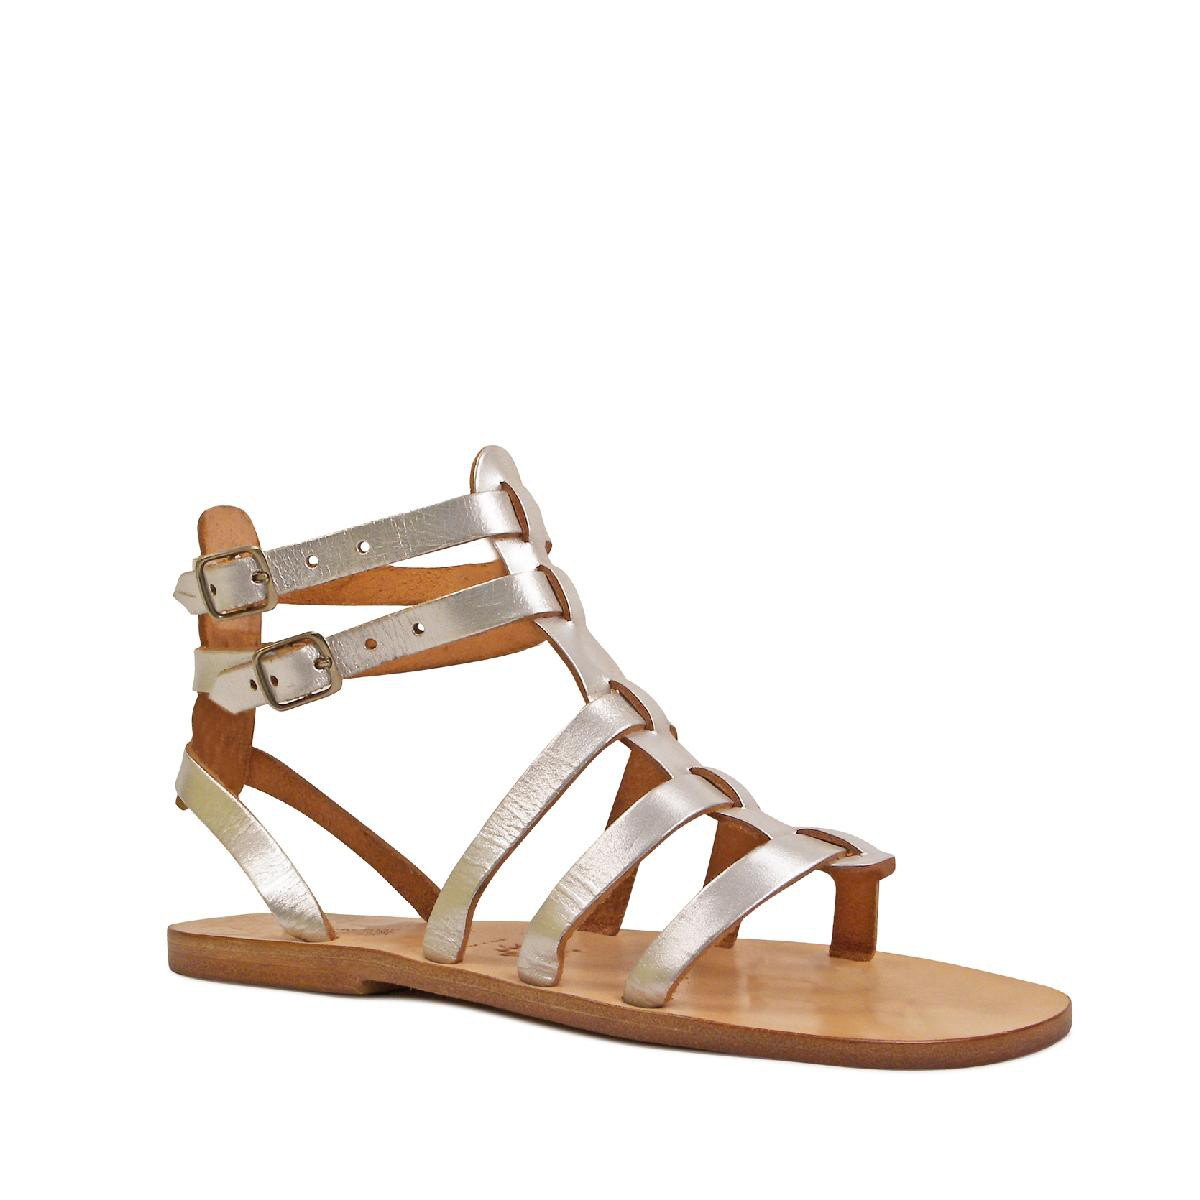 silberne damen sandalen im gladiator stil in italien von hand gefertigt gianluca das leder. Black Bedroom Furniture Sets. Home Design Ideas